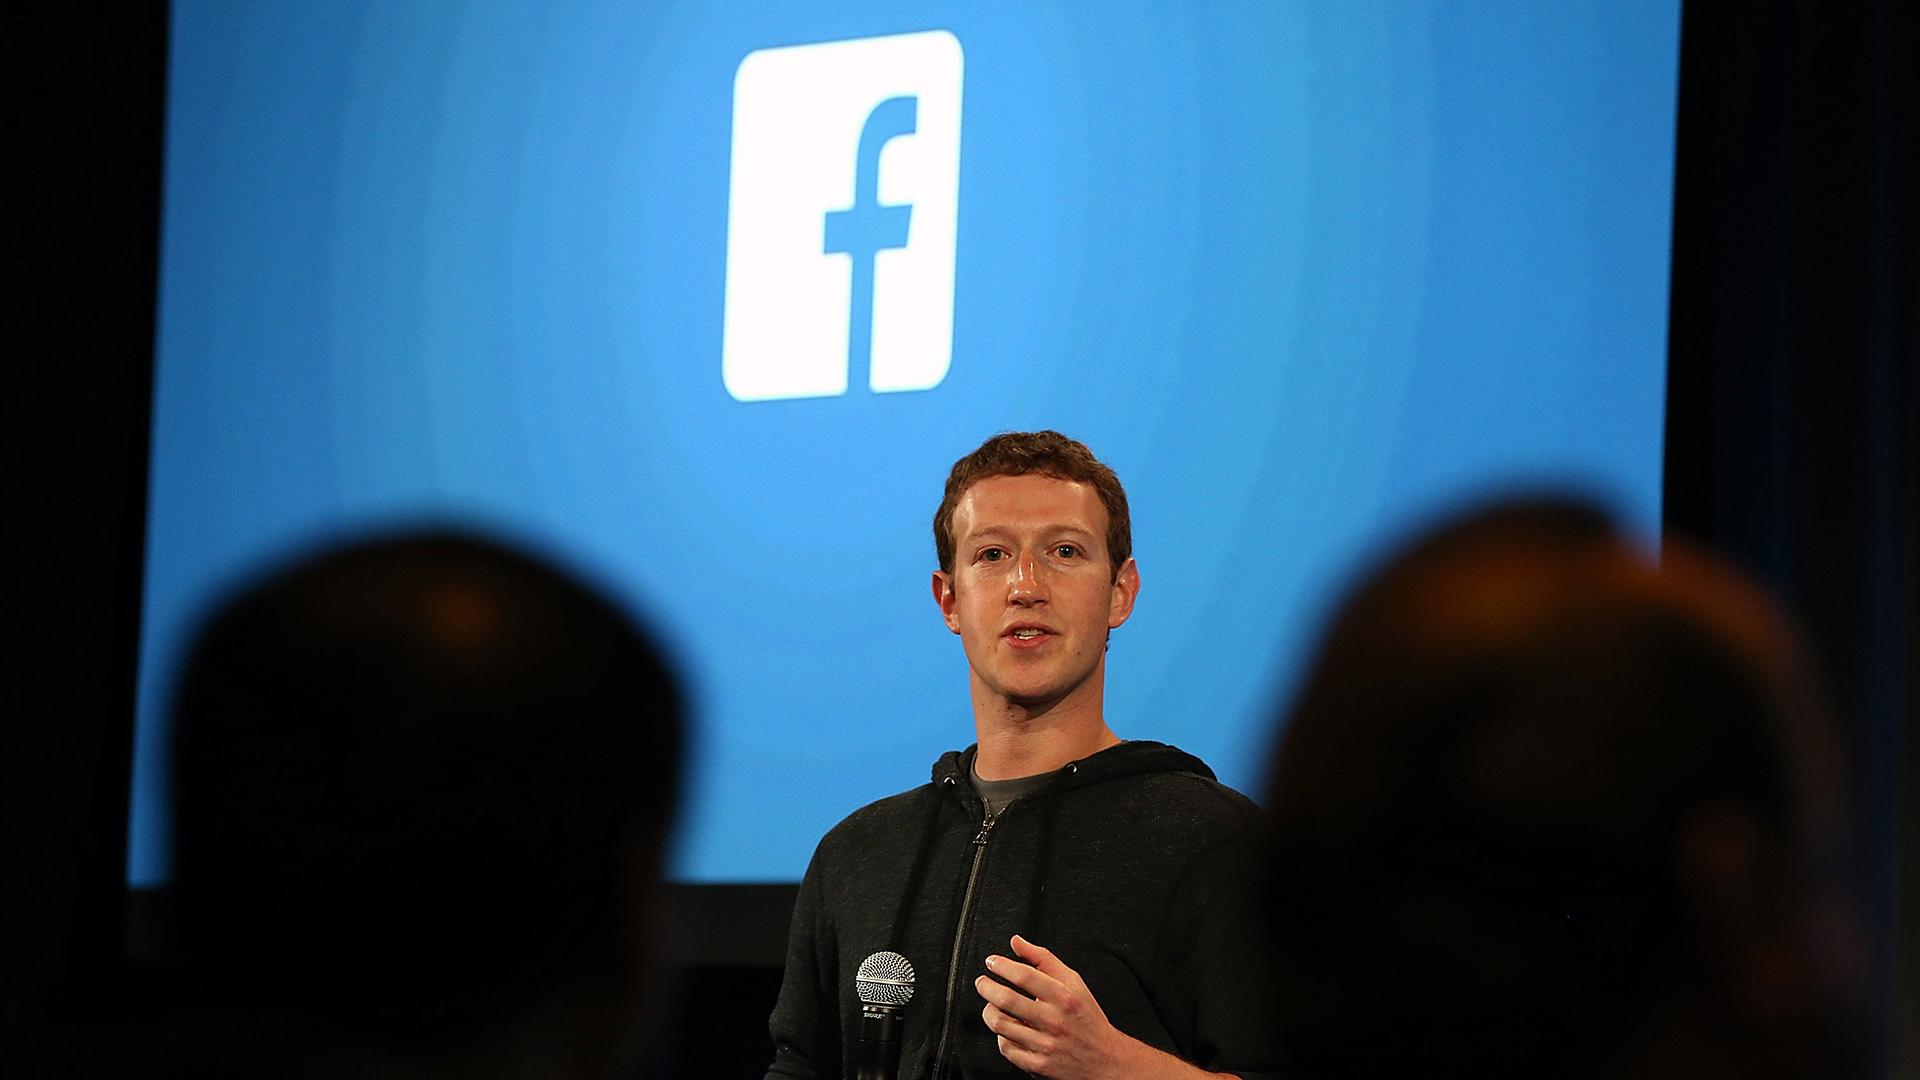 Mark Zuckerberg speaks at Facebook headquarters-159532.jpg79732150